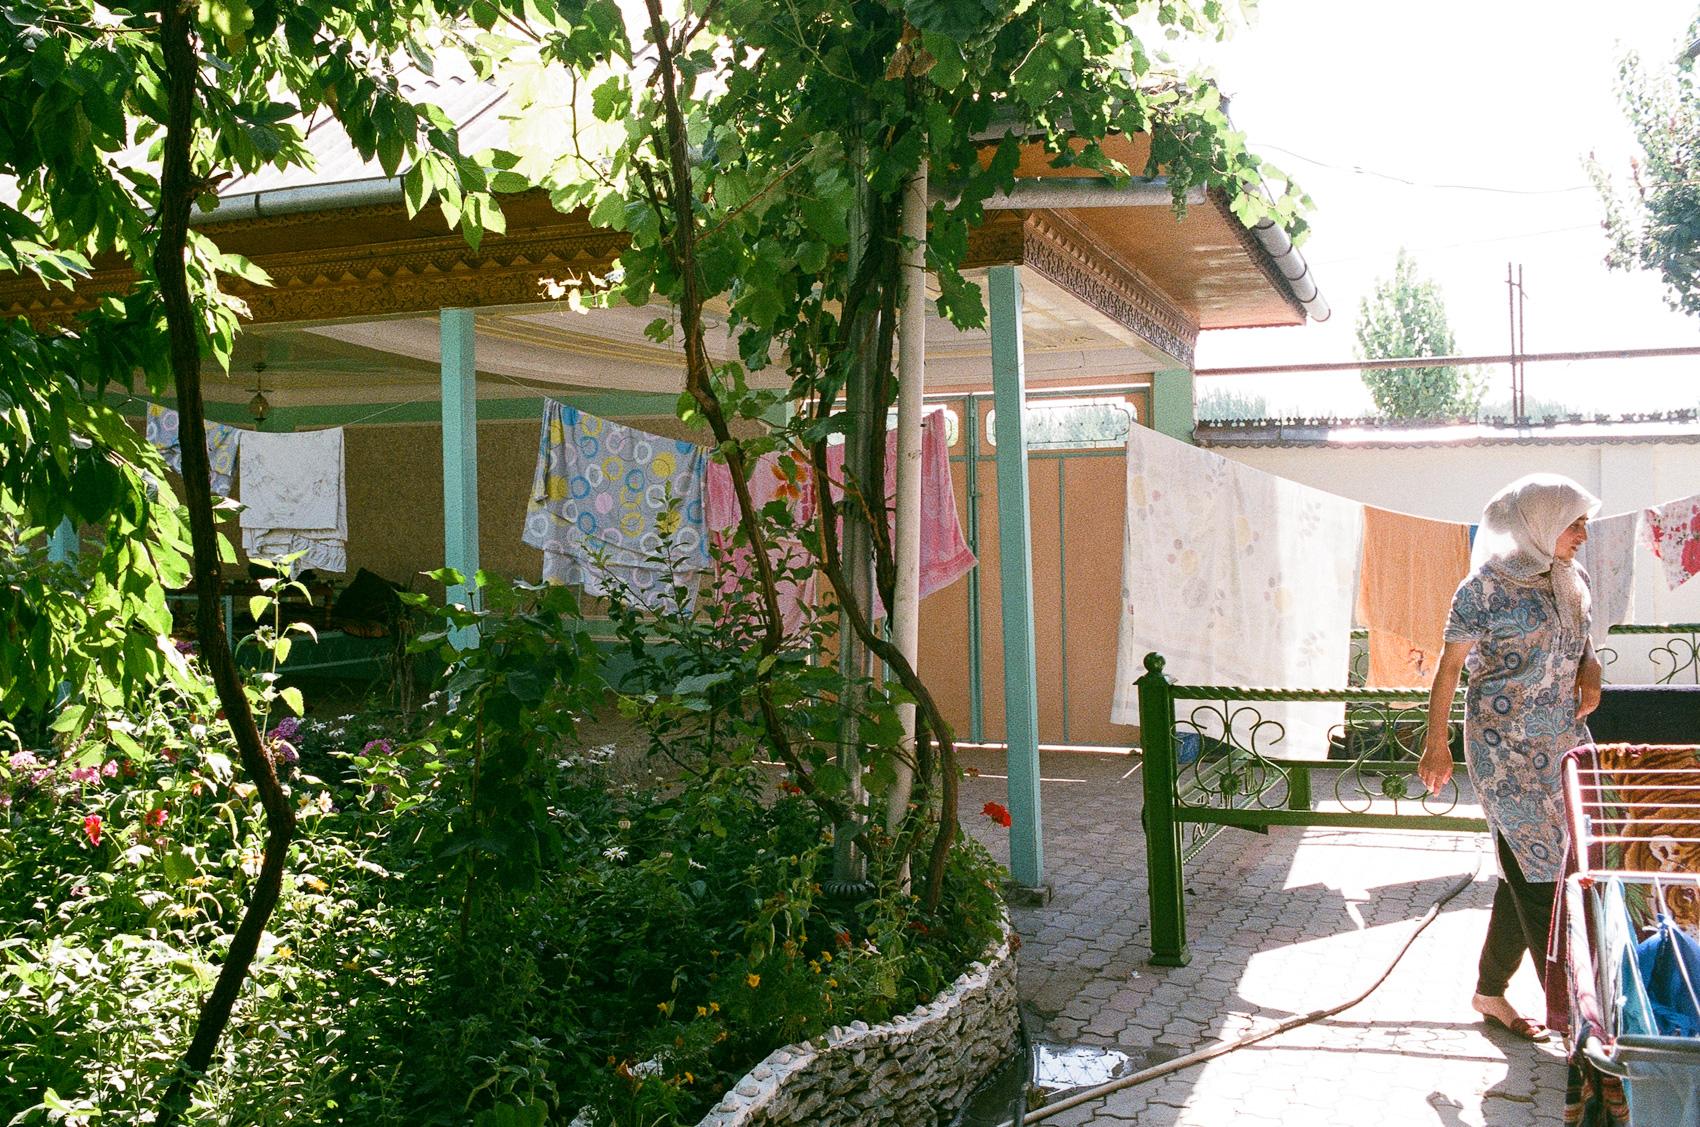 Gulshada's house